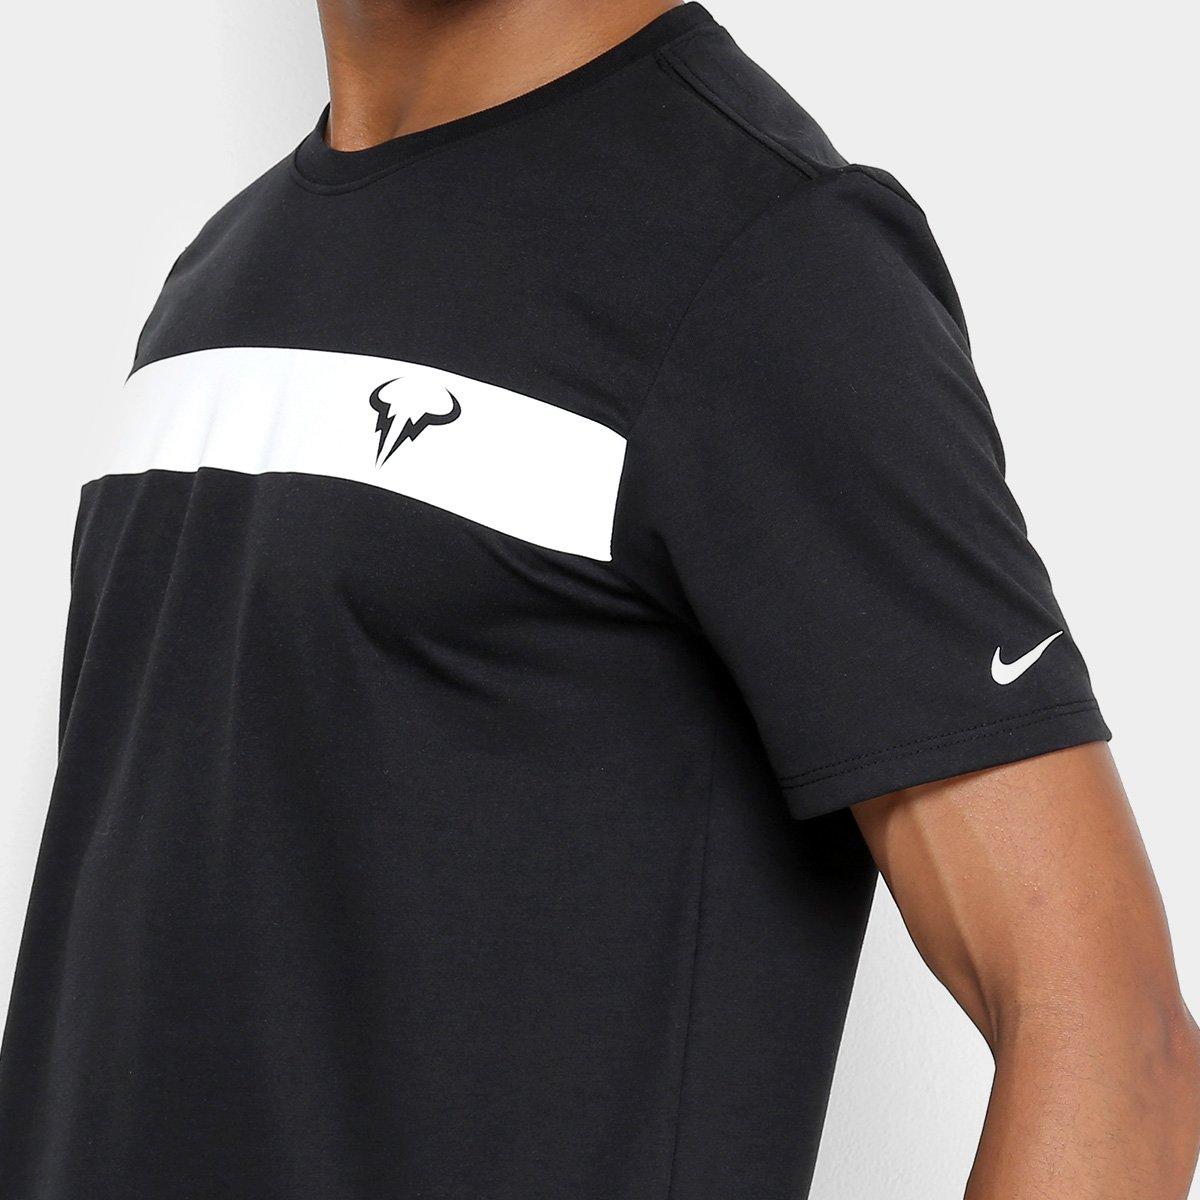 Camiseta NikeCourt Dry Rafa Masculina - Preto e Branco - Compre ... ce9b55d8ec524